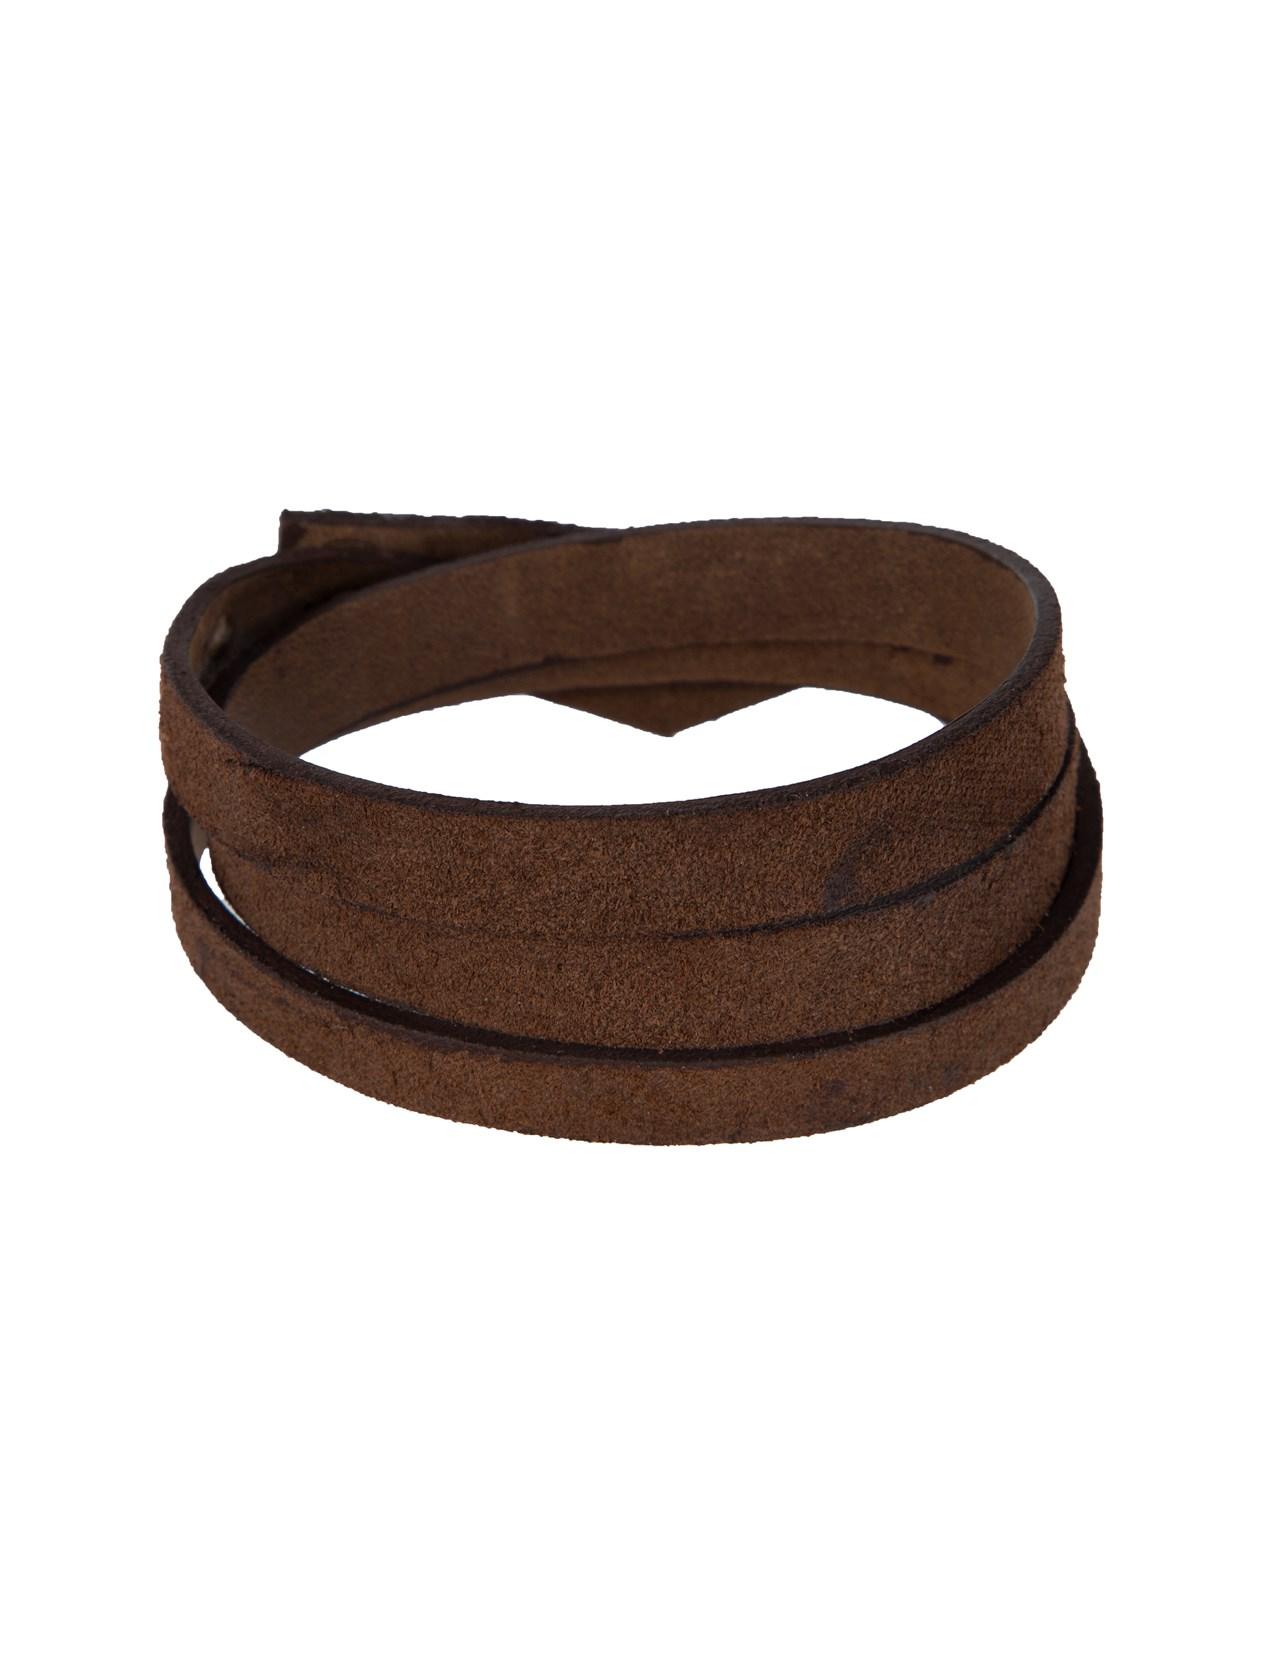 دستبند چرم بزرگسال - چرم لانکا تک سایز - قهوه اي - 1